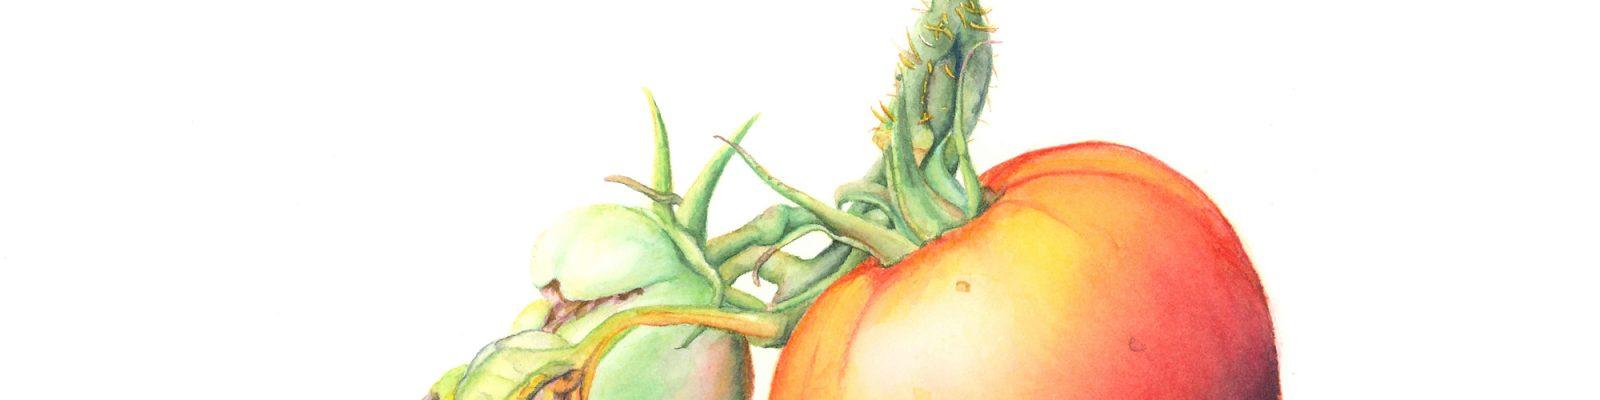 Brandi Malarkey, artist. ItsAllMalarkey.com Solanum lycopersicum Tomato Watercolor 10x10.75